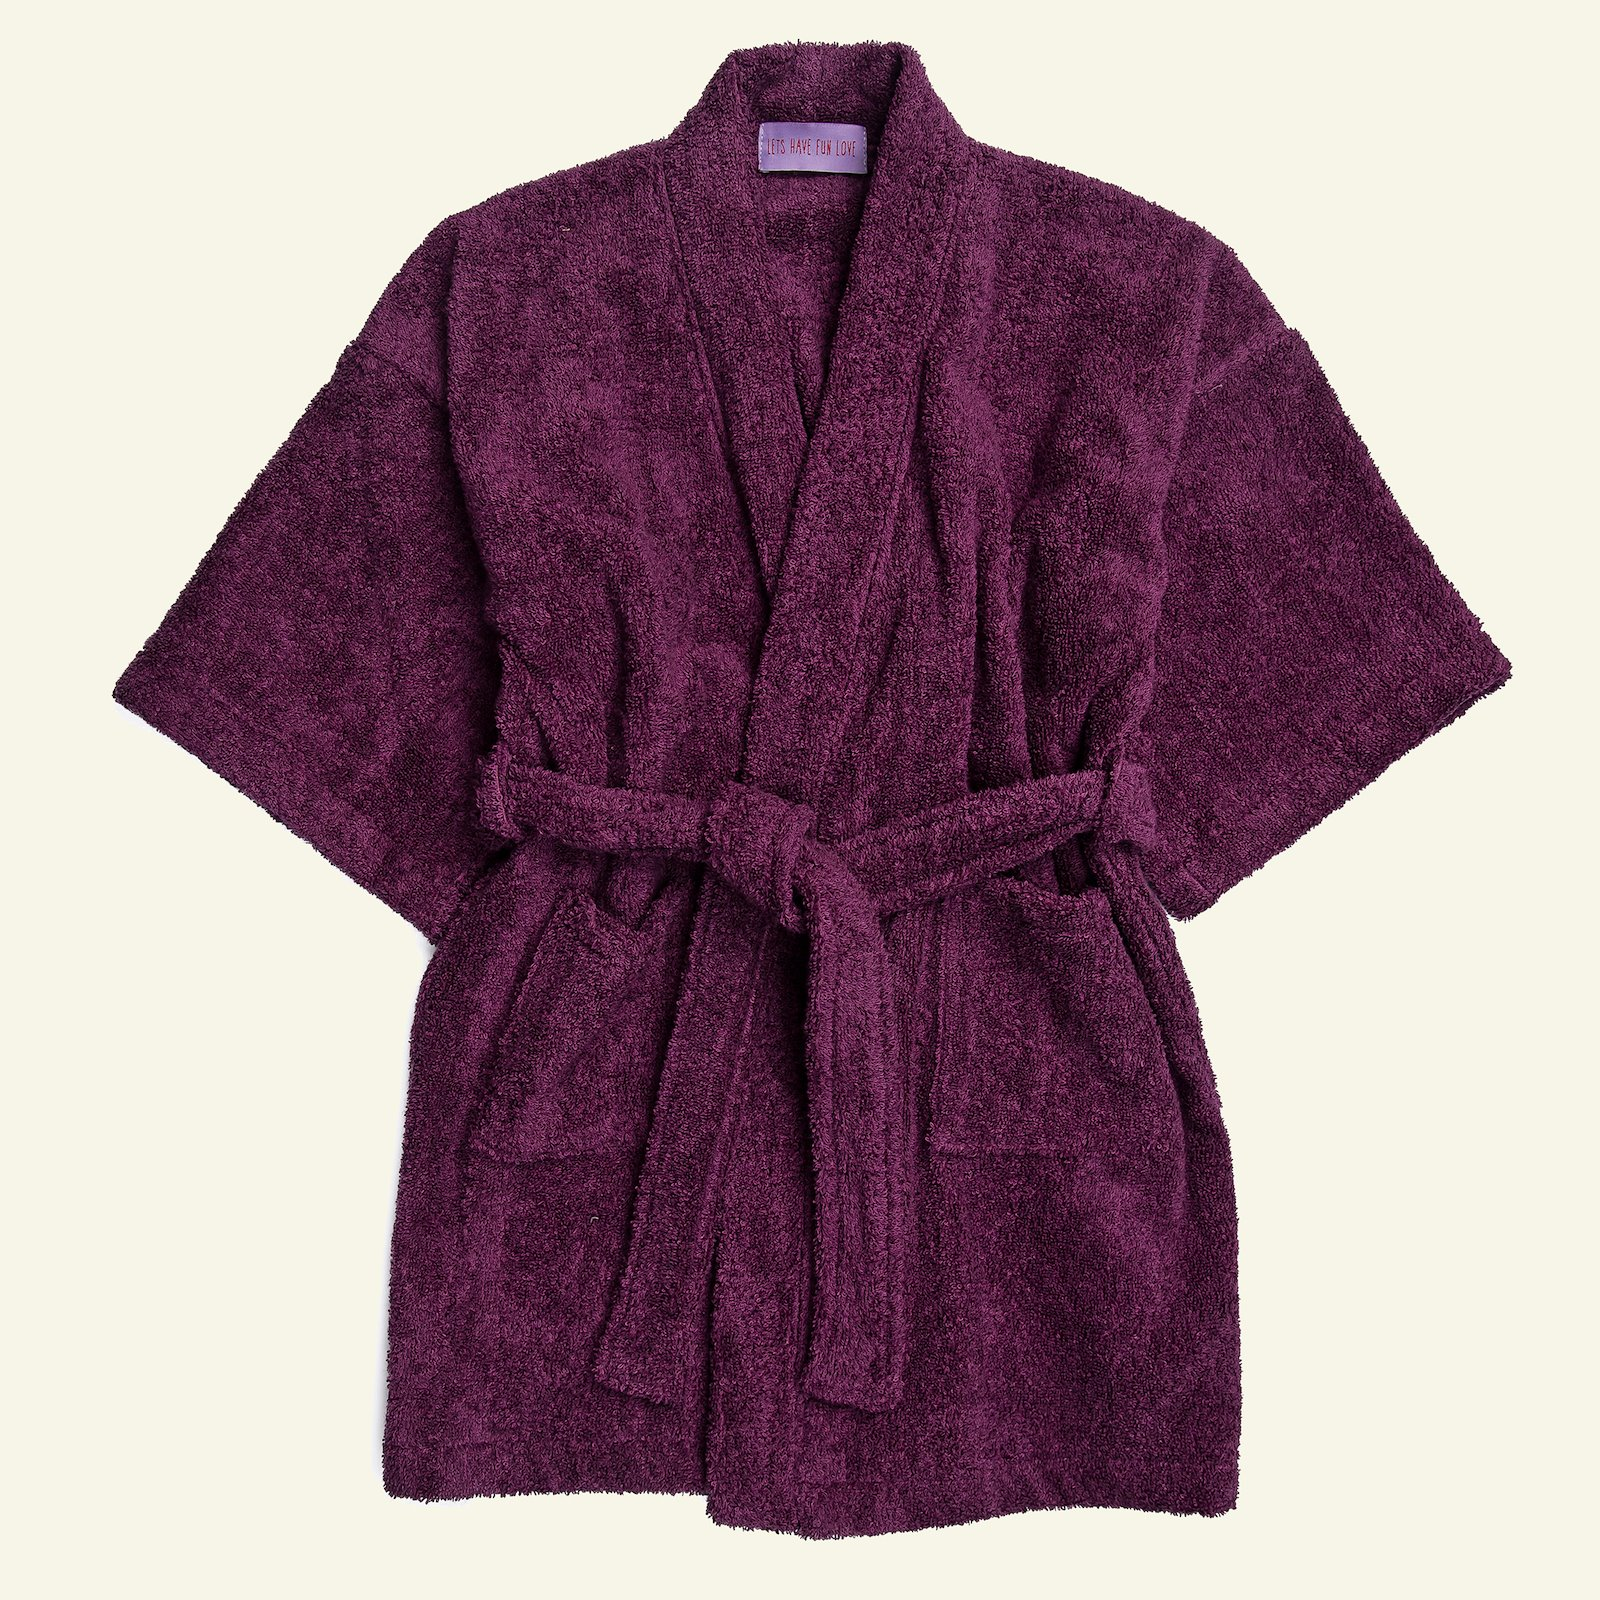 Kimono and tunika, 104/4y p63057_250007_26455_sskit